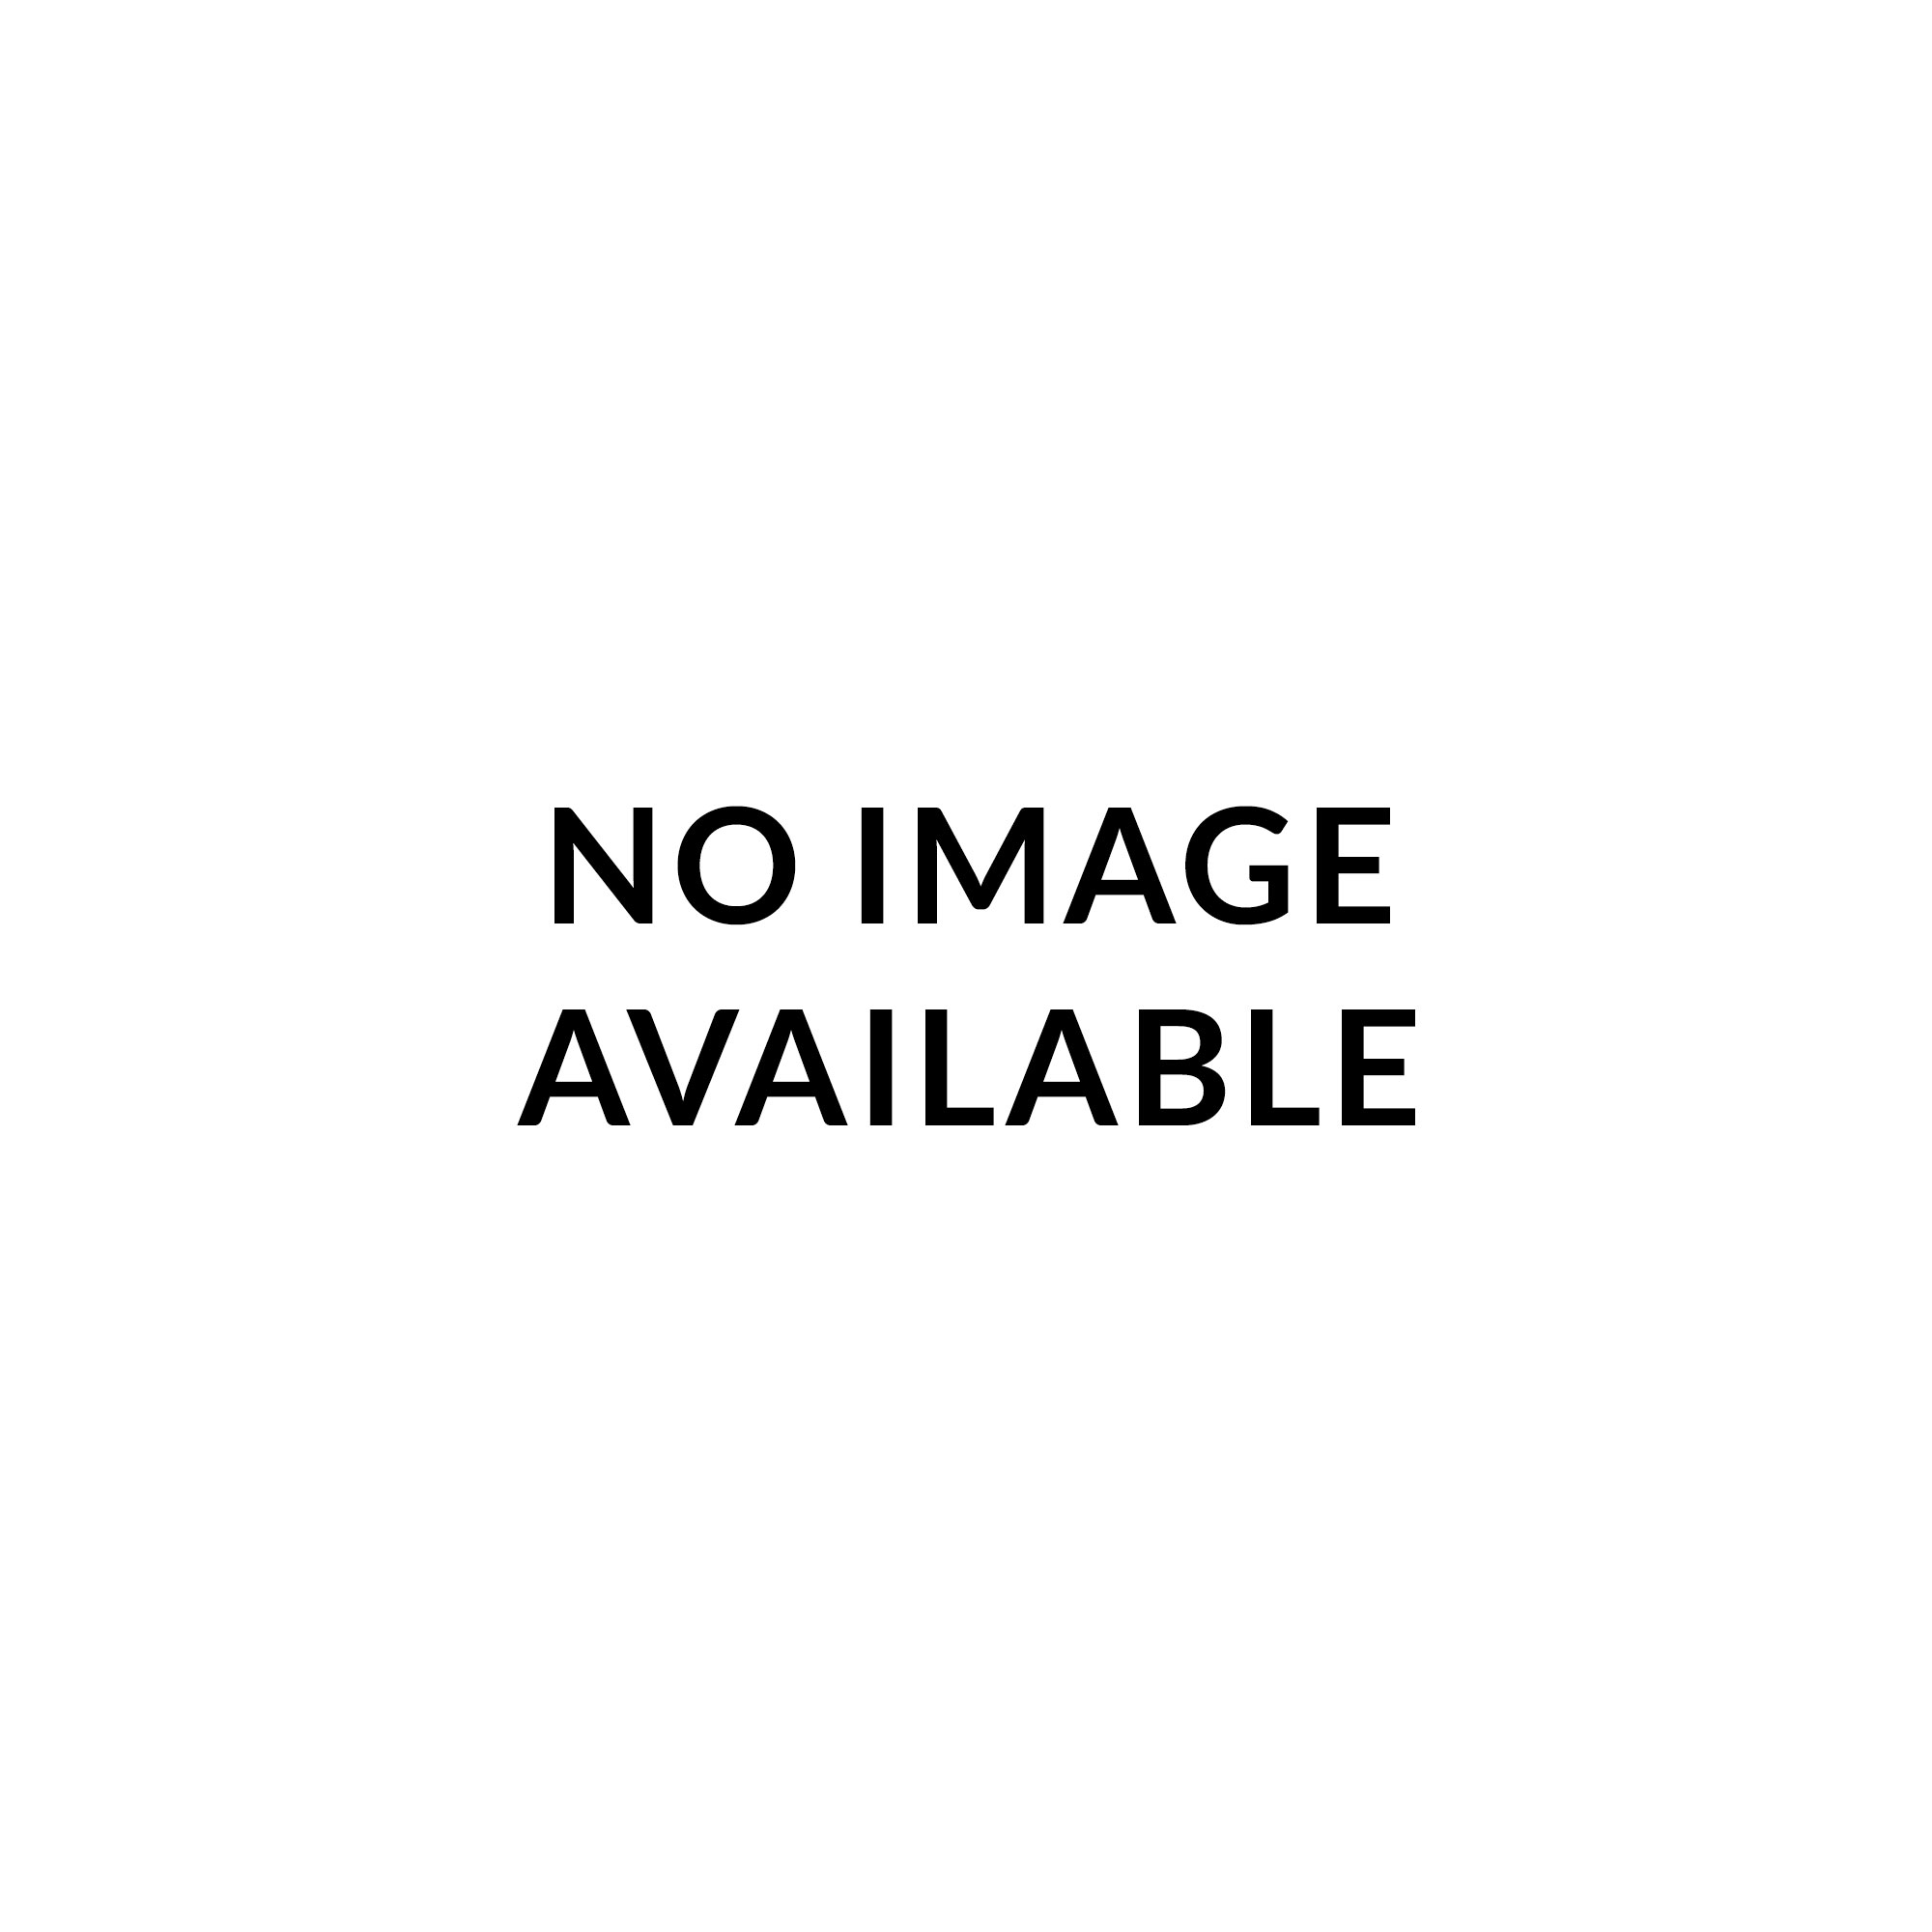 D'Addario XB145SL Nickel Wound XL Bass Guitar Single String .145 Super Long Scale